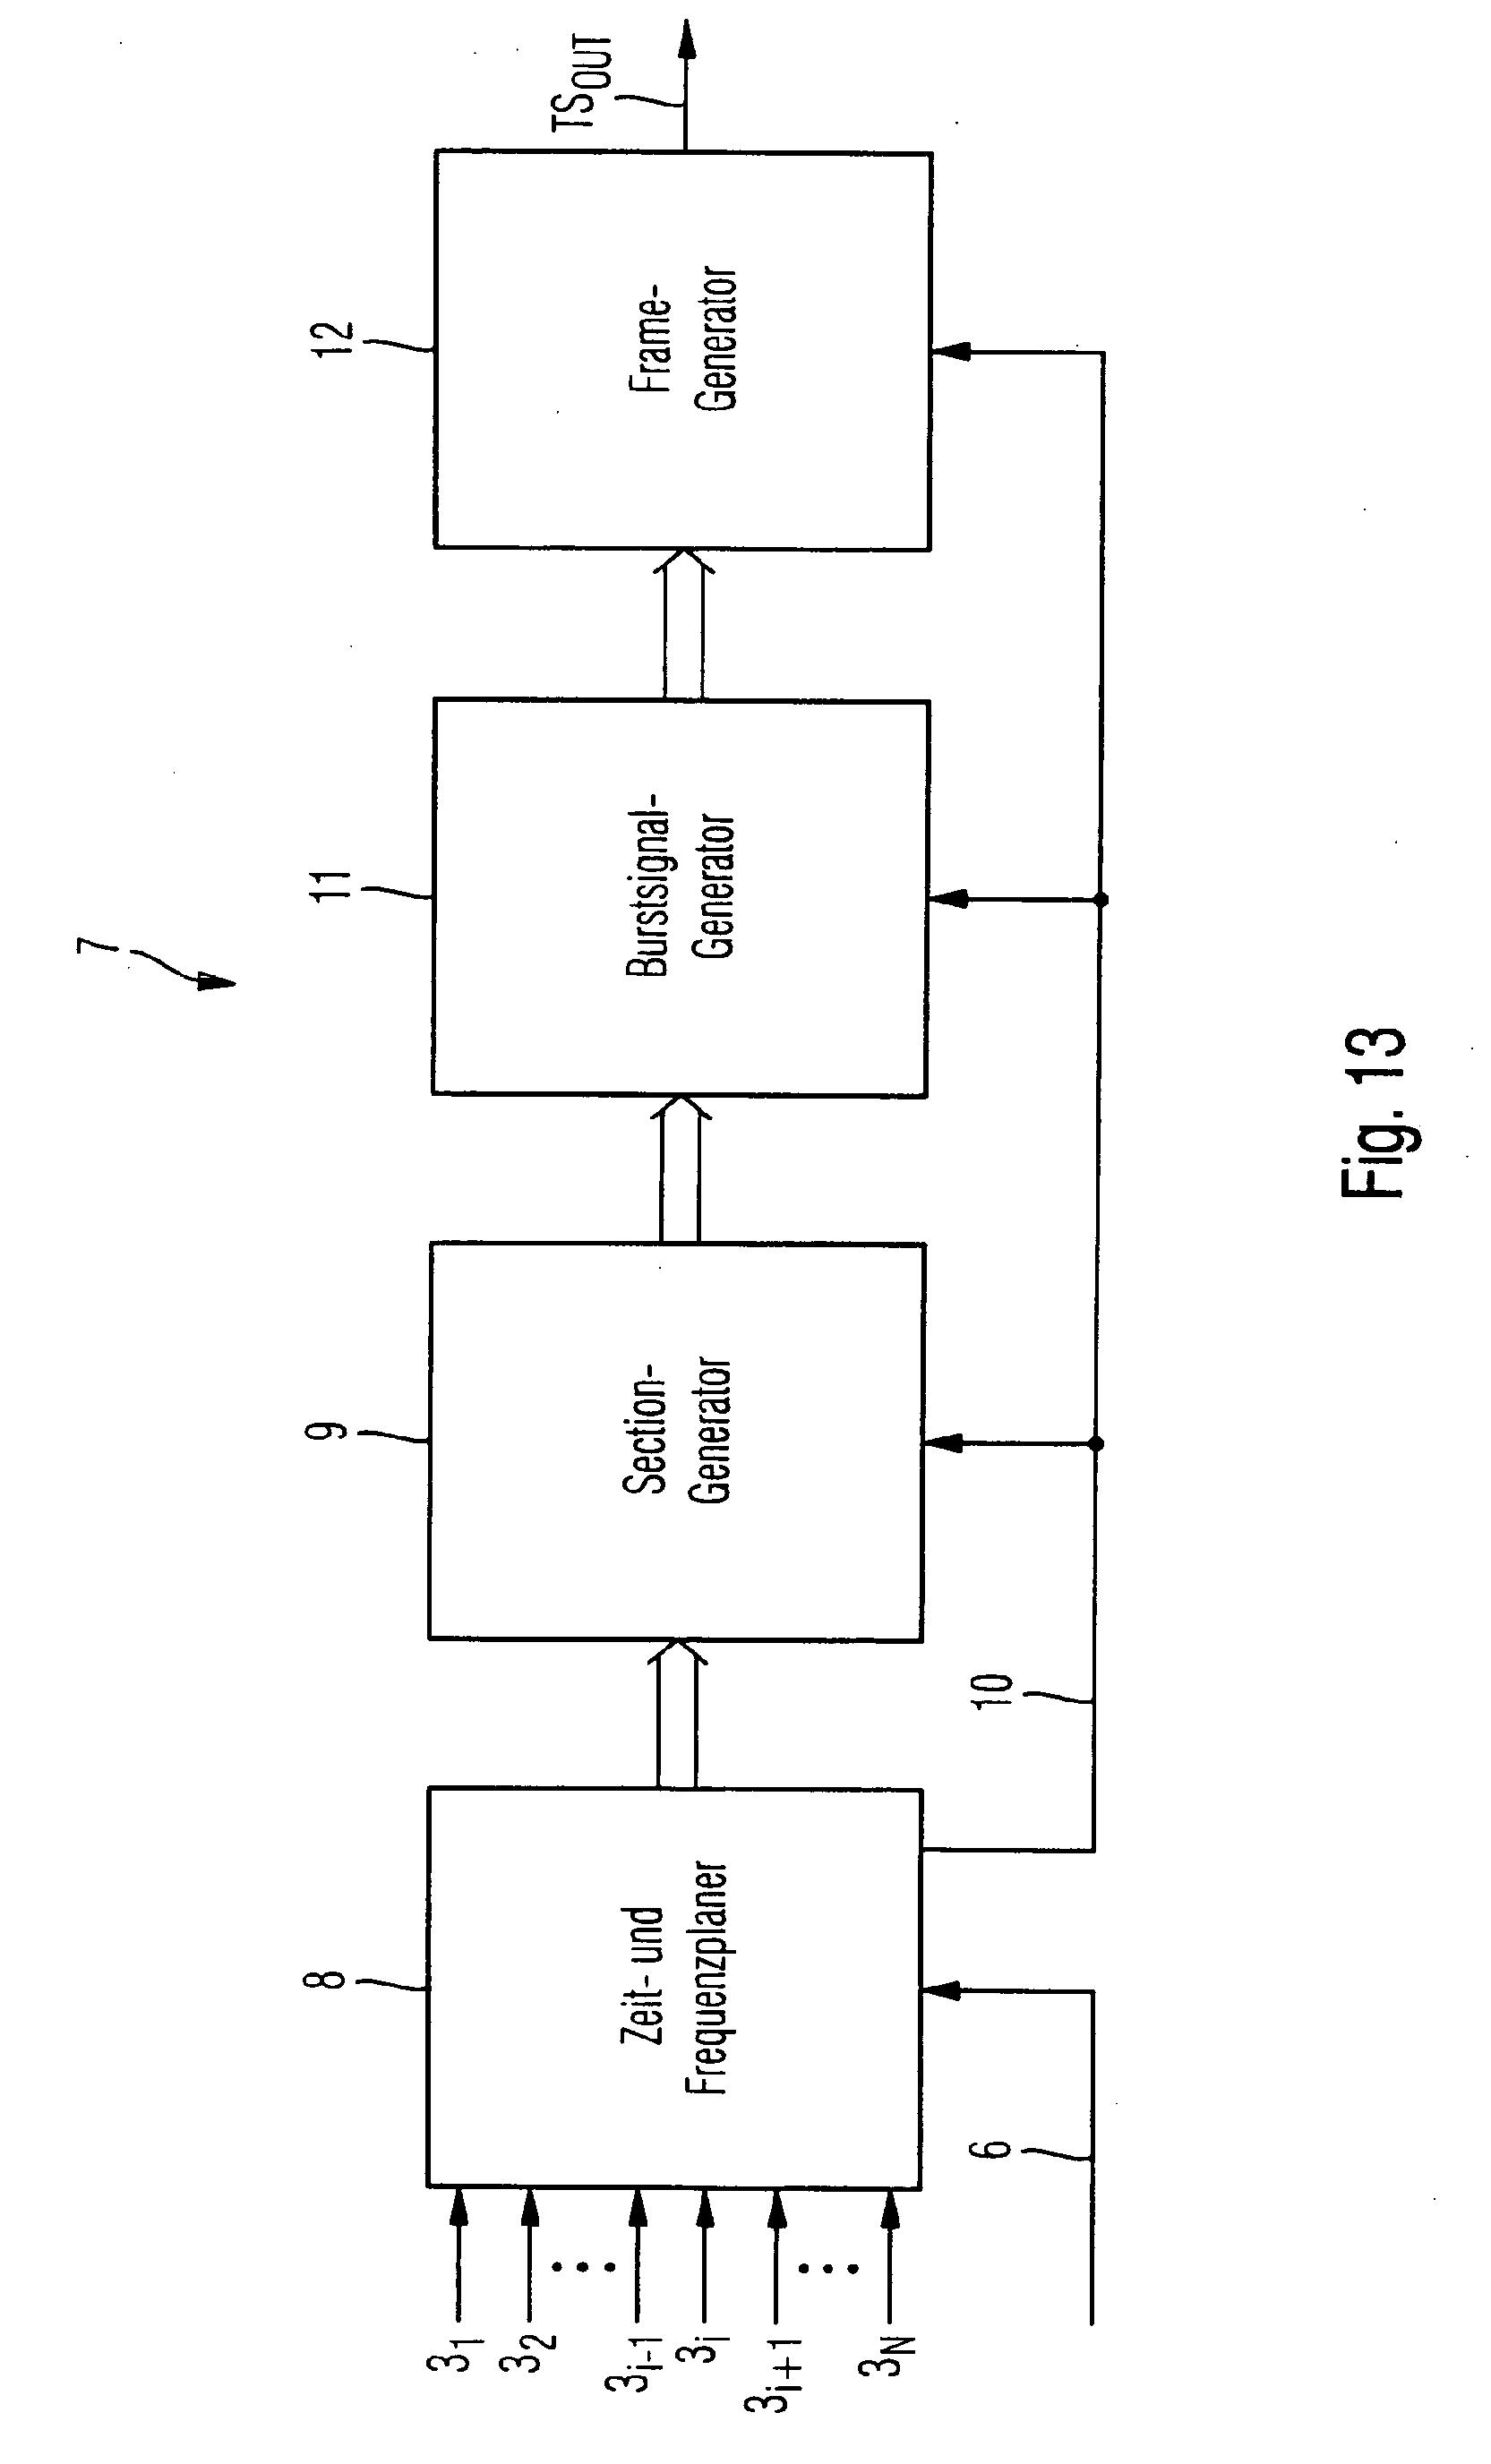 专利ep1924016a2 - optimierte